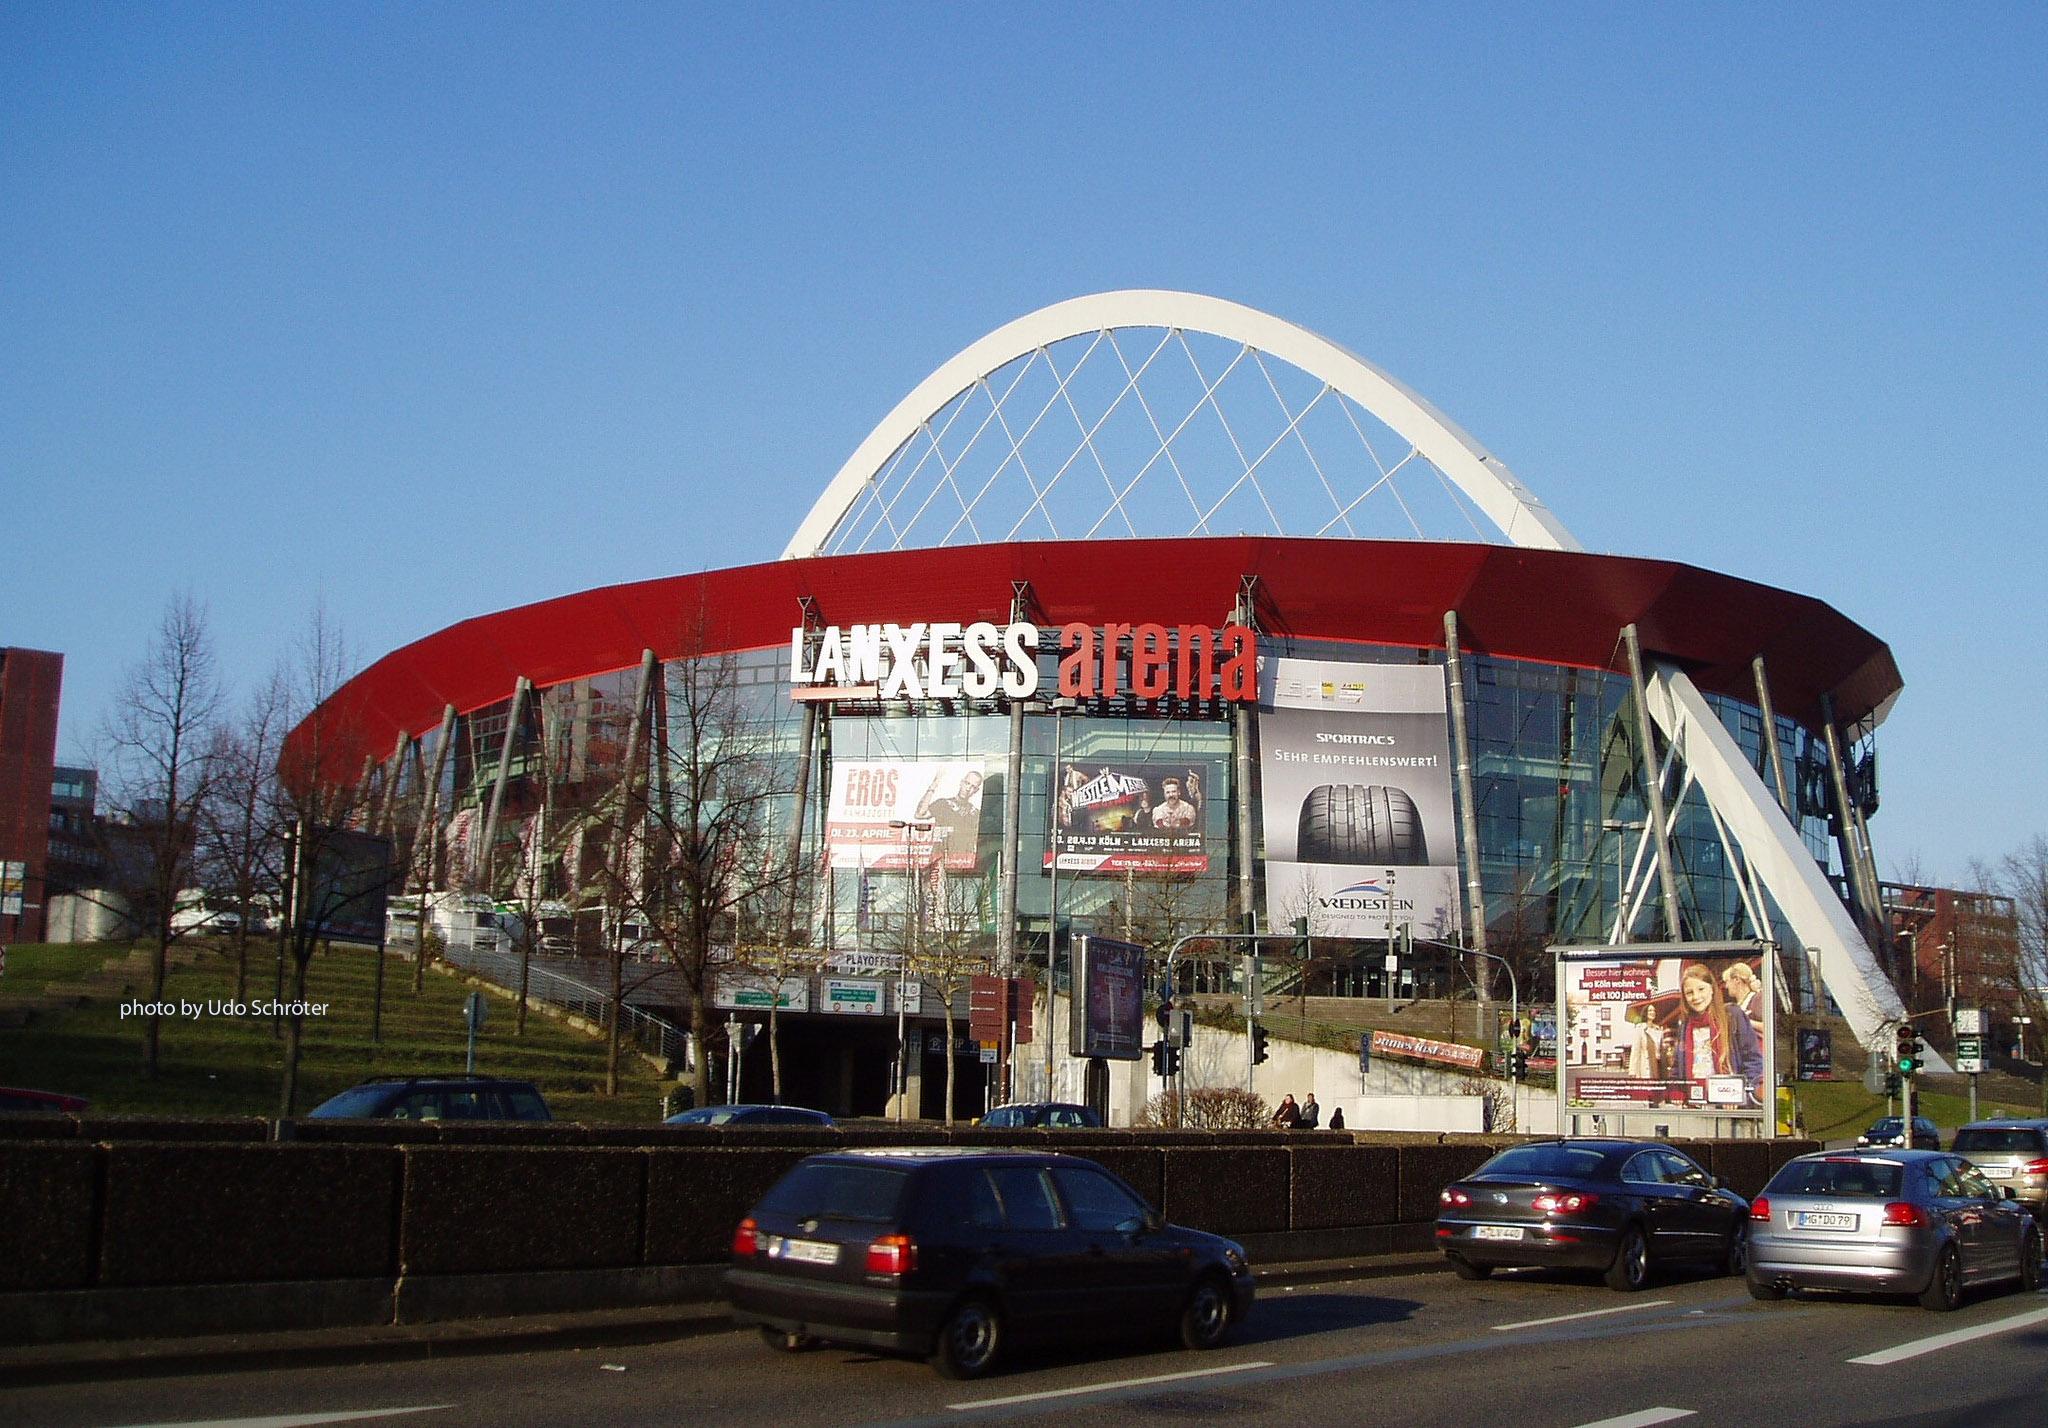 Lanxess Arena Parkhaus